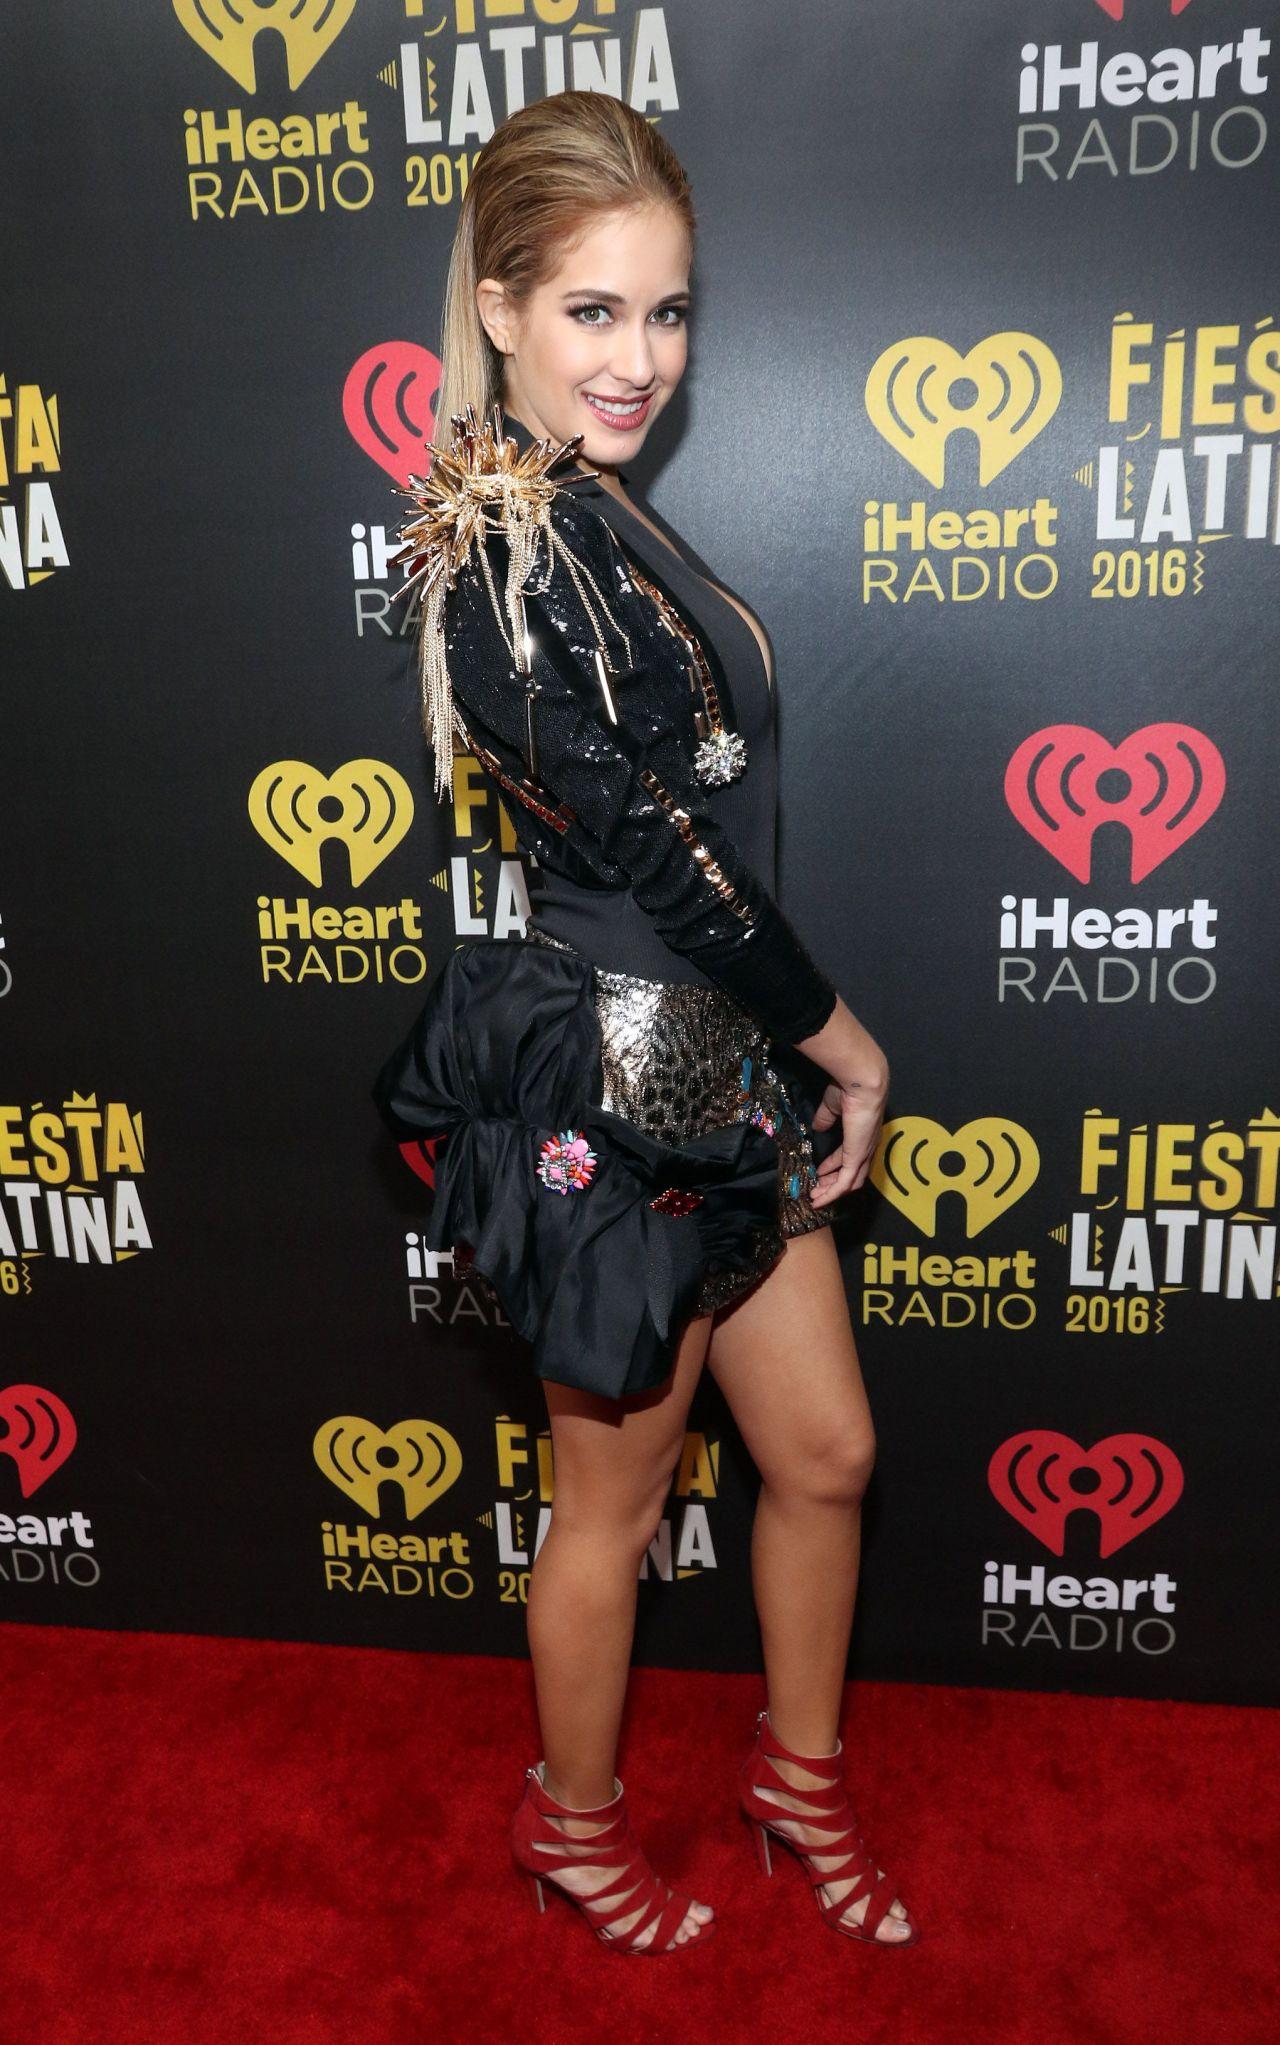 Carmen Aub - iHeart Radio Fiesta Latina 2016 in Florida 11 ... Gaby Espino 2017